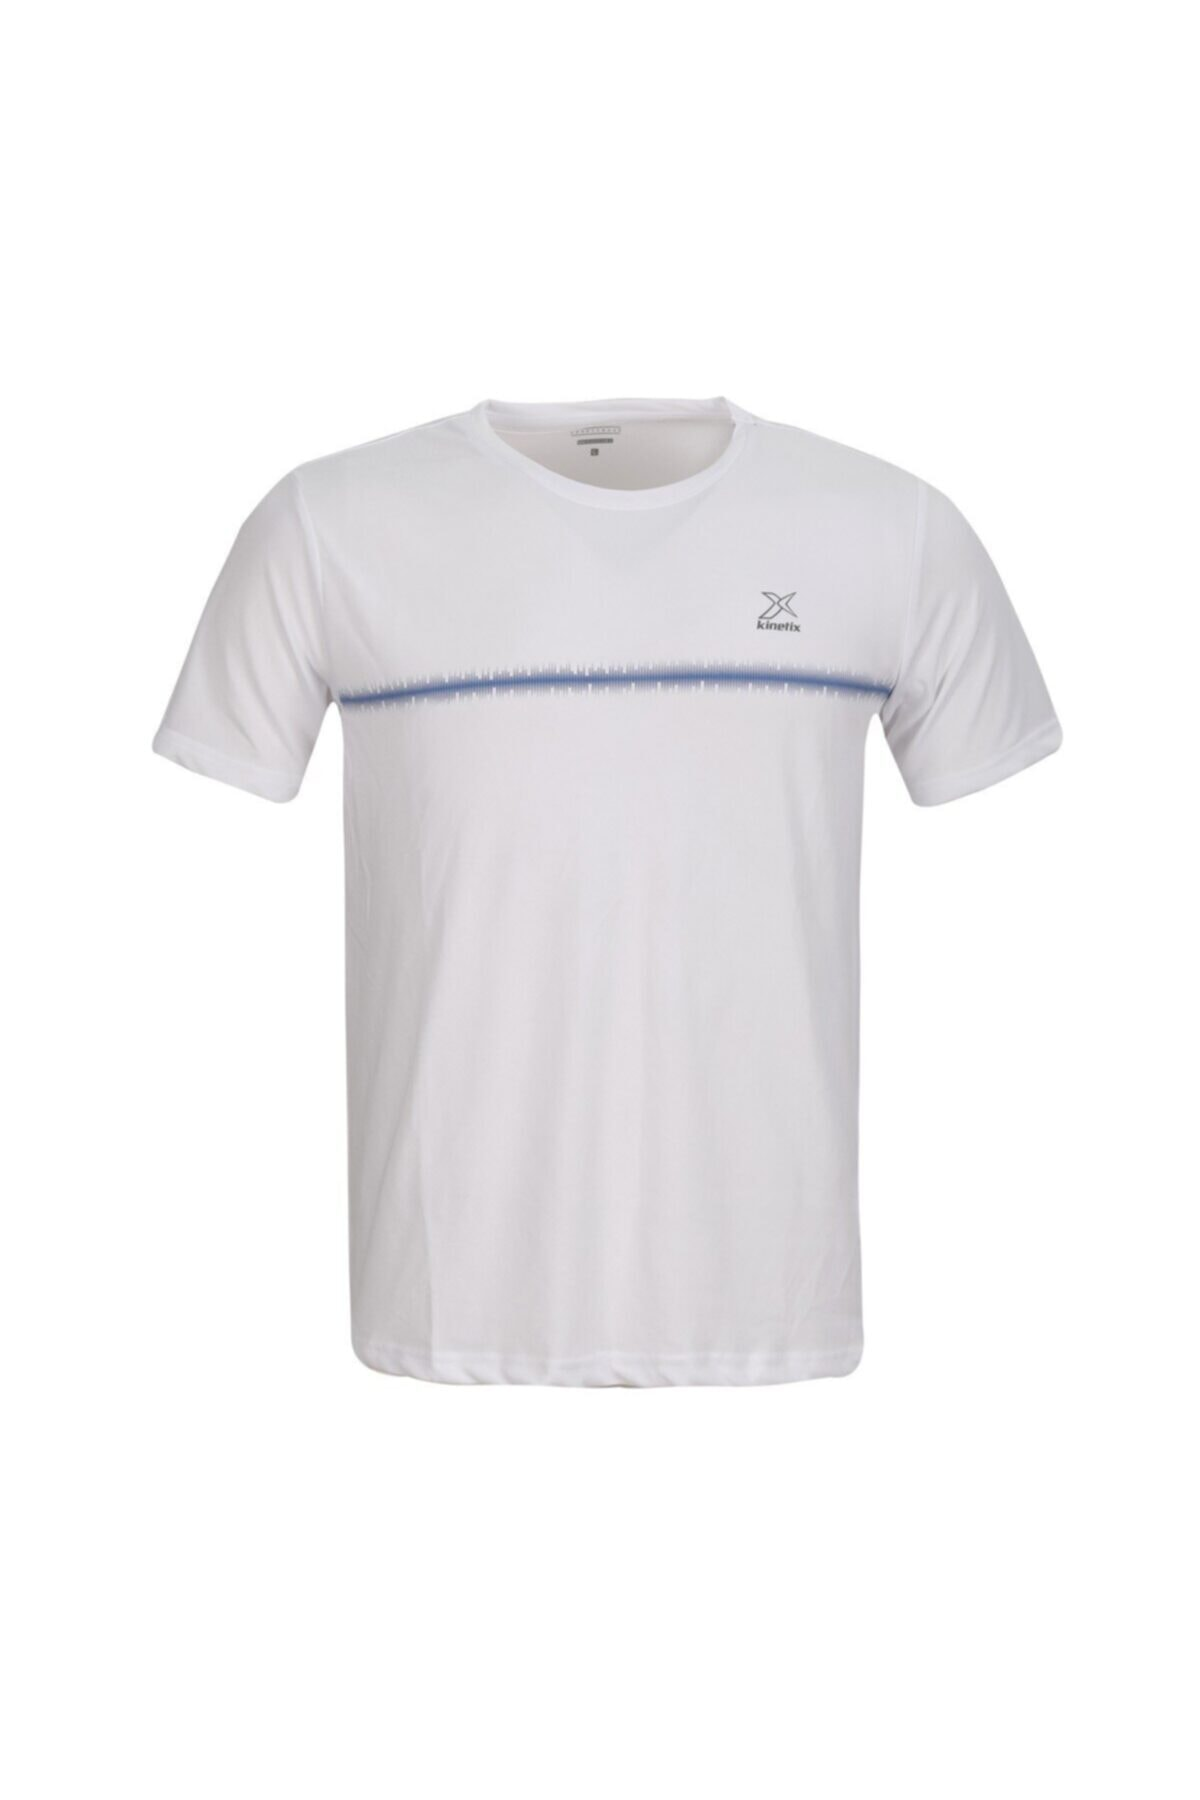 SN262 EDDY T-SHIRT Beyaz Erkek T-Shirt 100581681